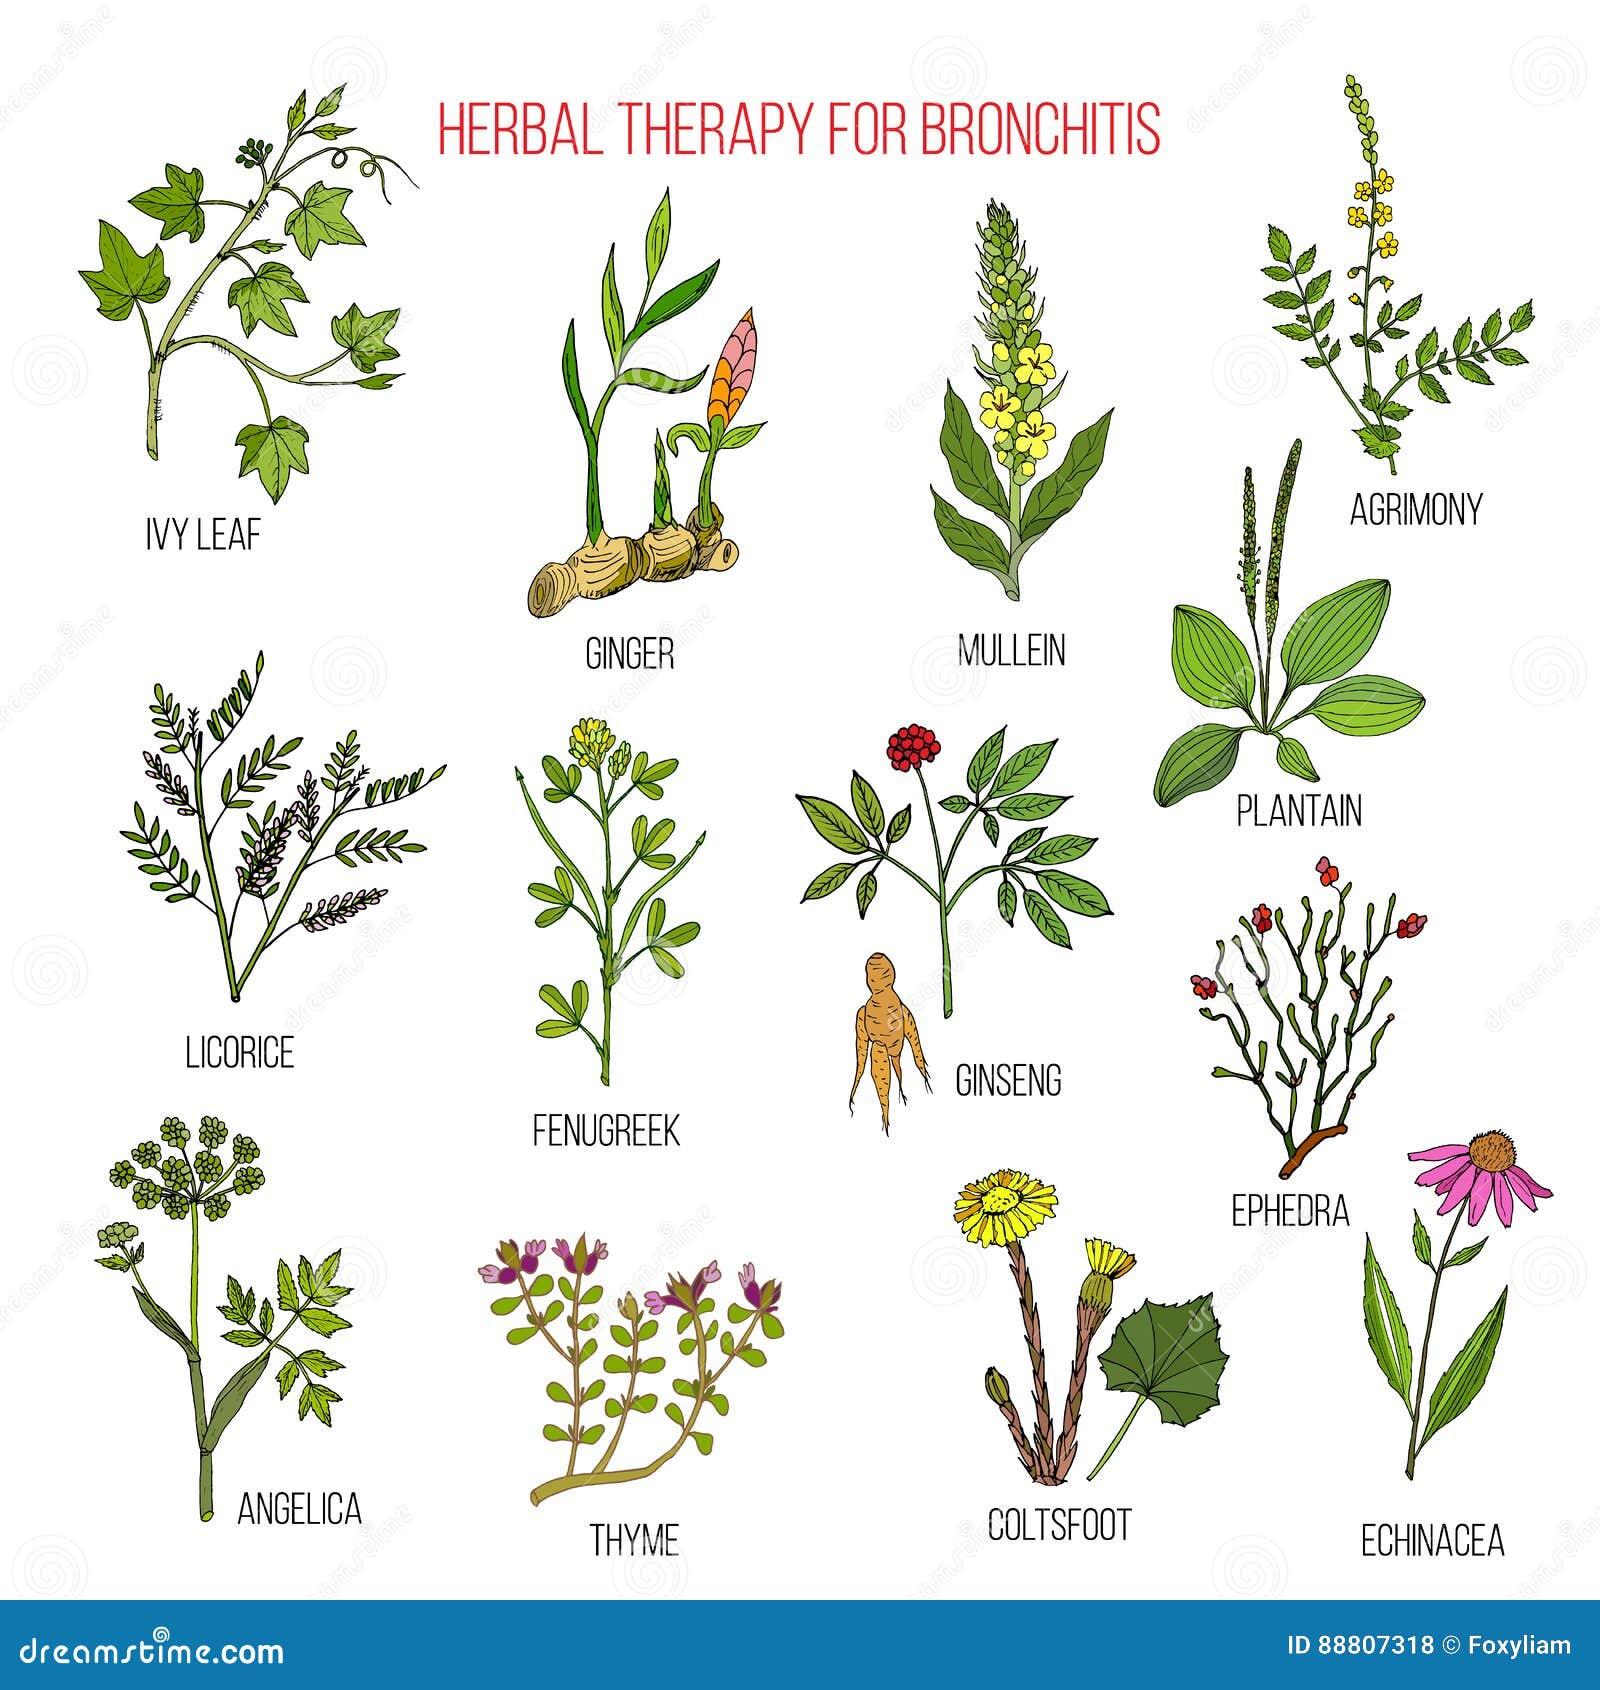 Kruidentherapie voor bronchitisklimop, agrimony gember, mullein, zoethout, fenegriek, ginseng, ephedra, weegbree, engelwortel